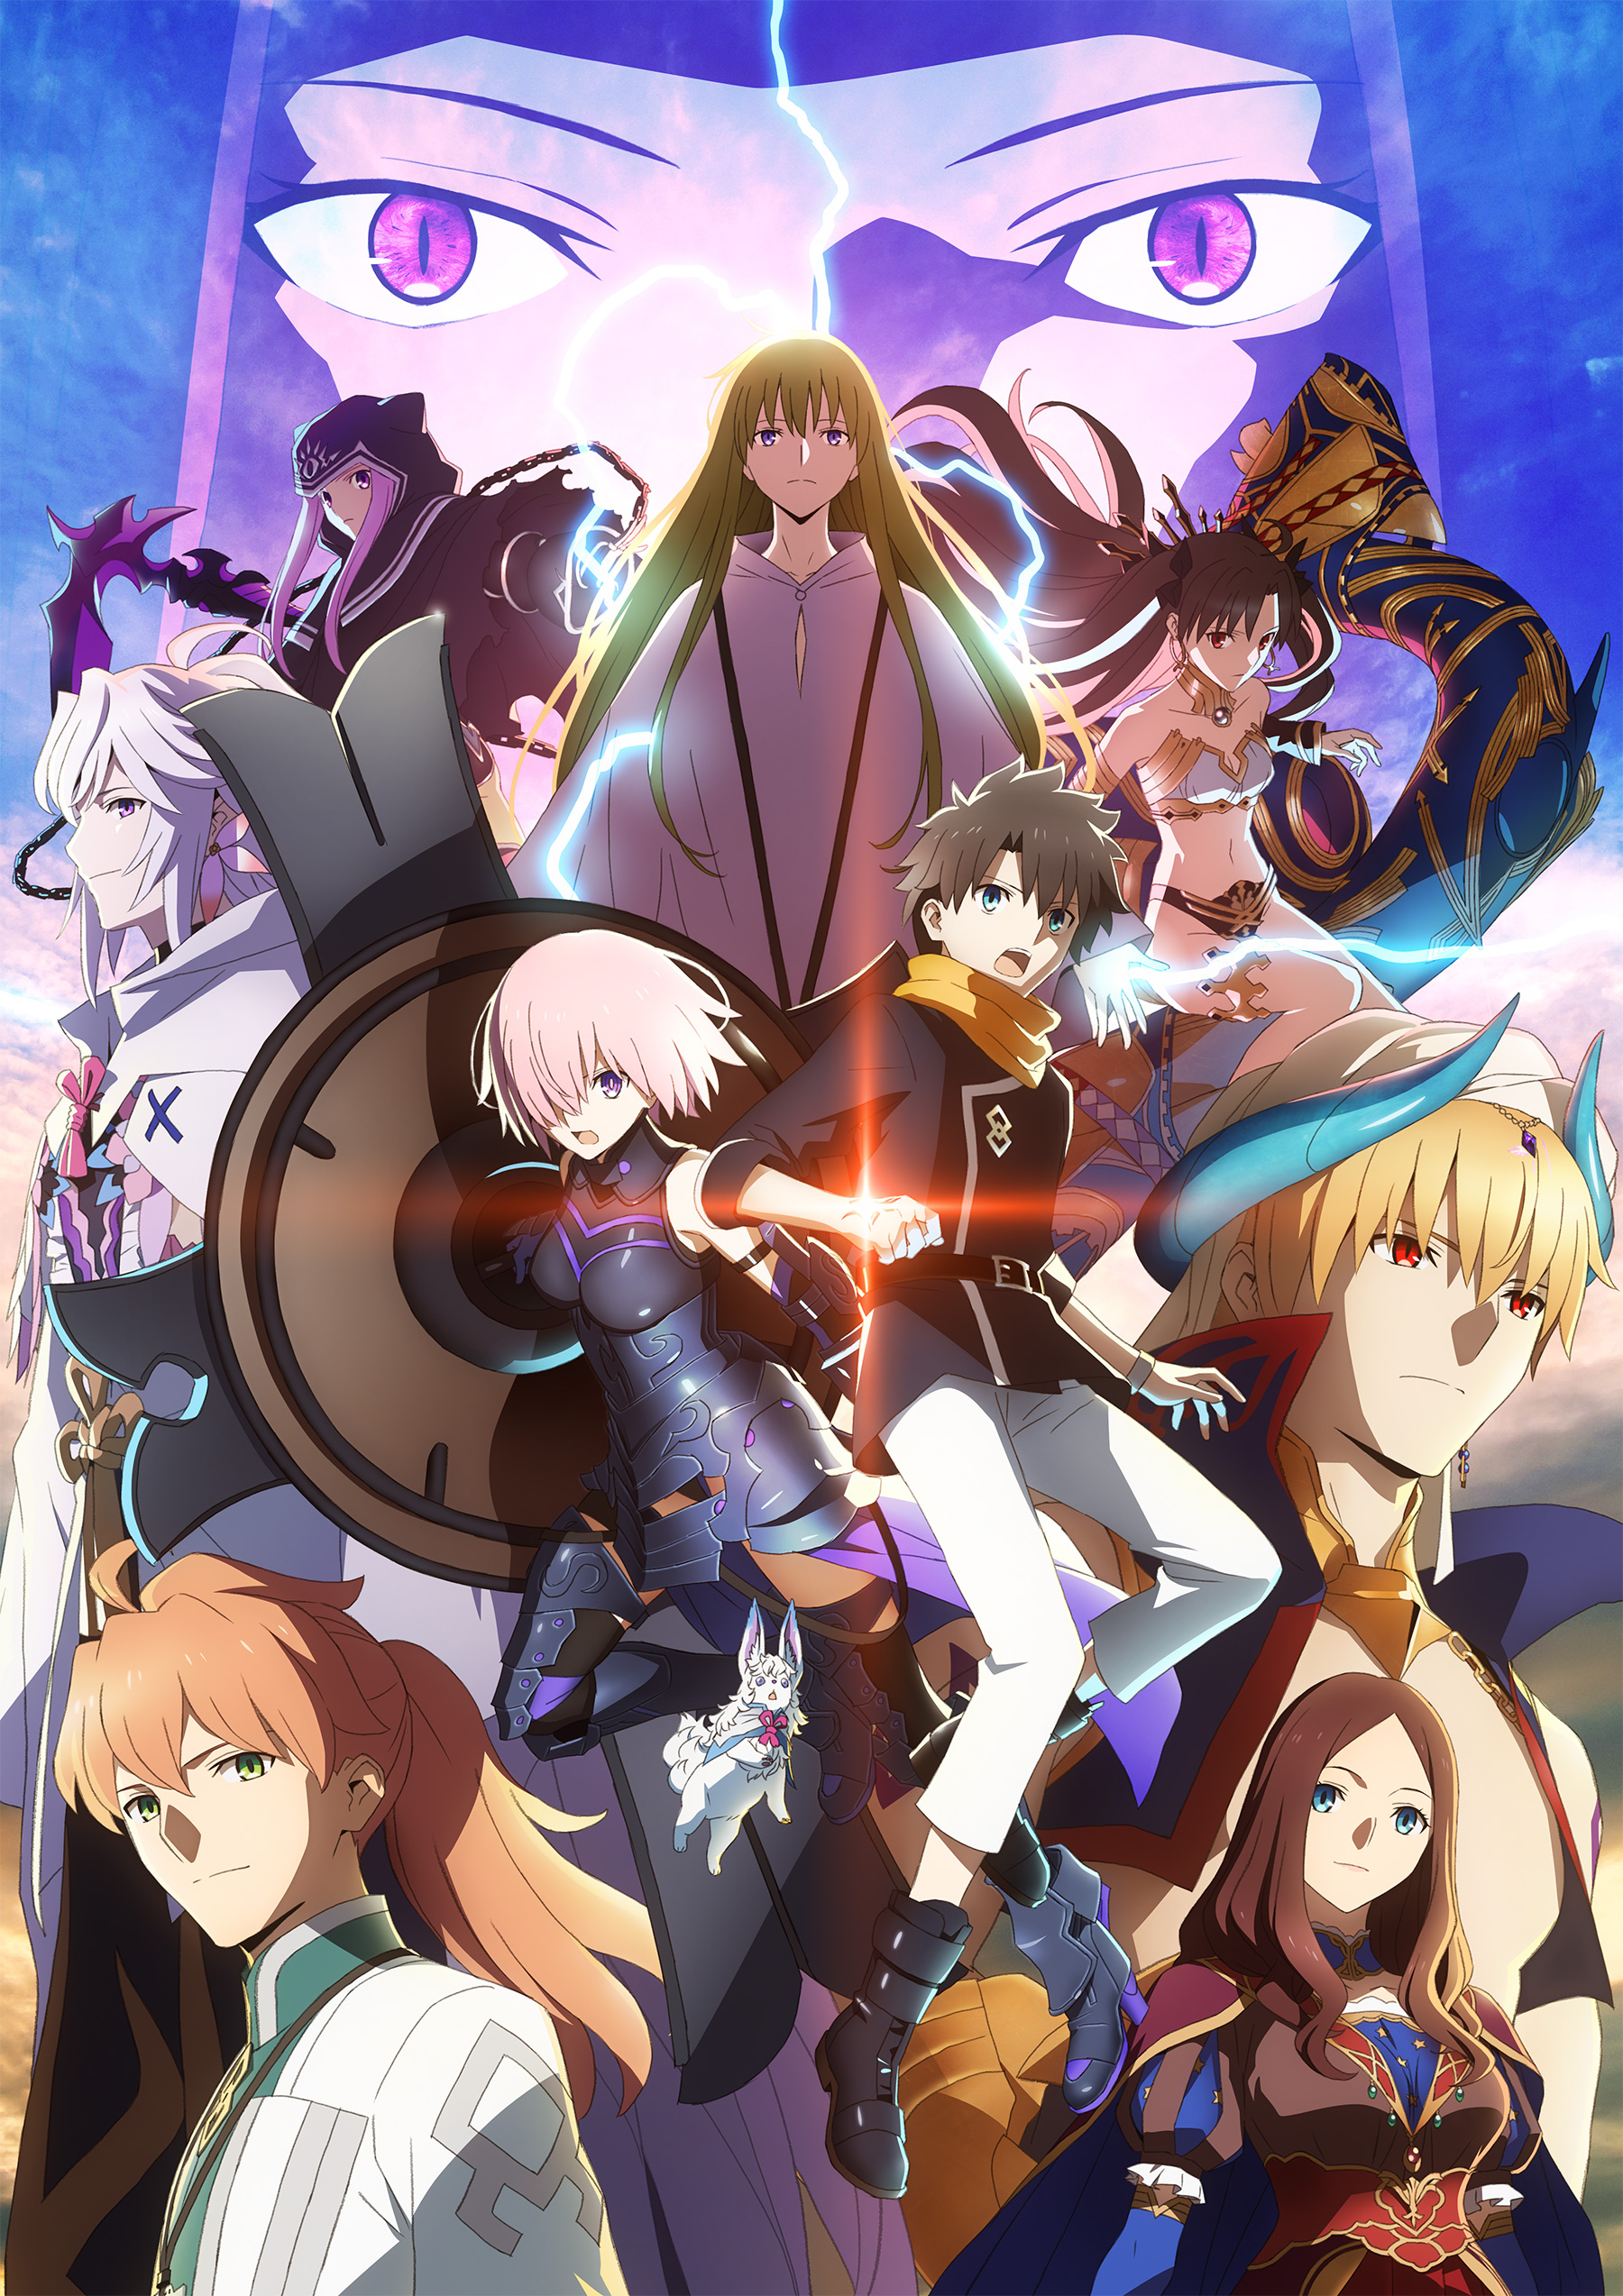 [FLsnow][Fate/Grand Order -絕對魔獸戰線巴比倫尼亞- / Fate/Grand Order -絶対魔獣戦線バビロニア-][06][720p][繁體內嵌]